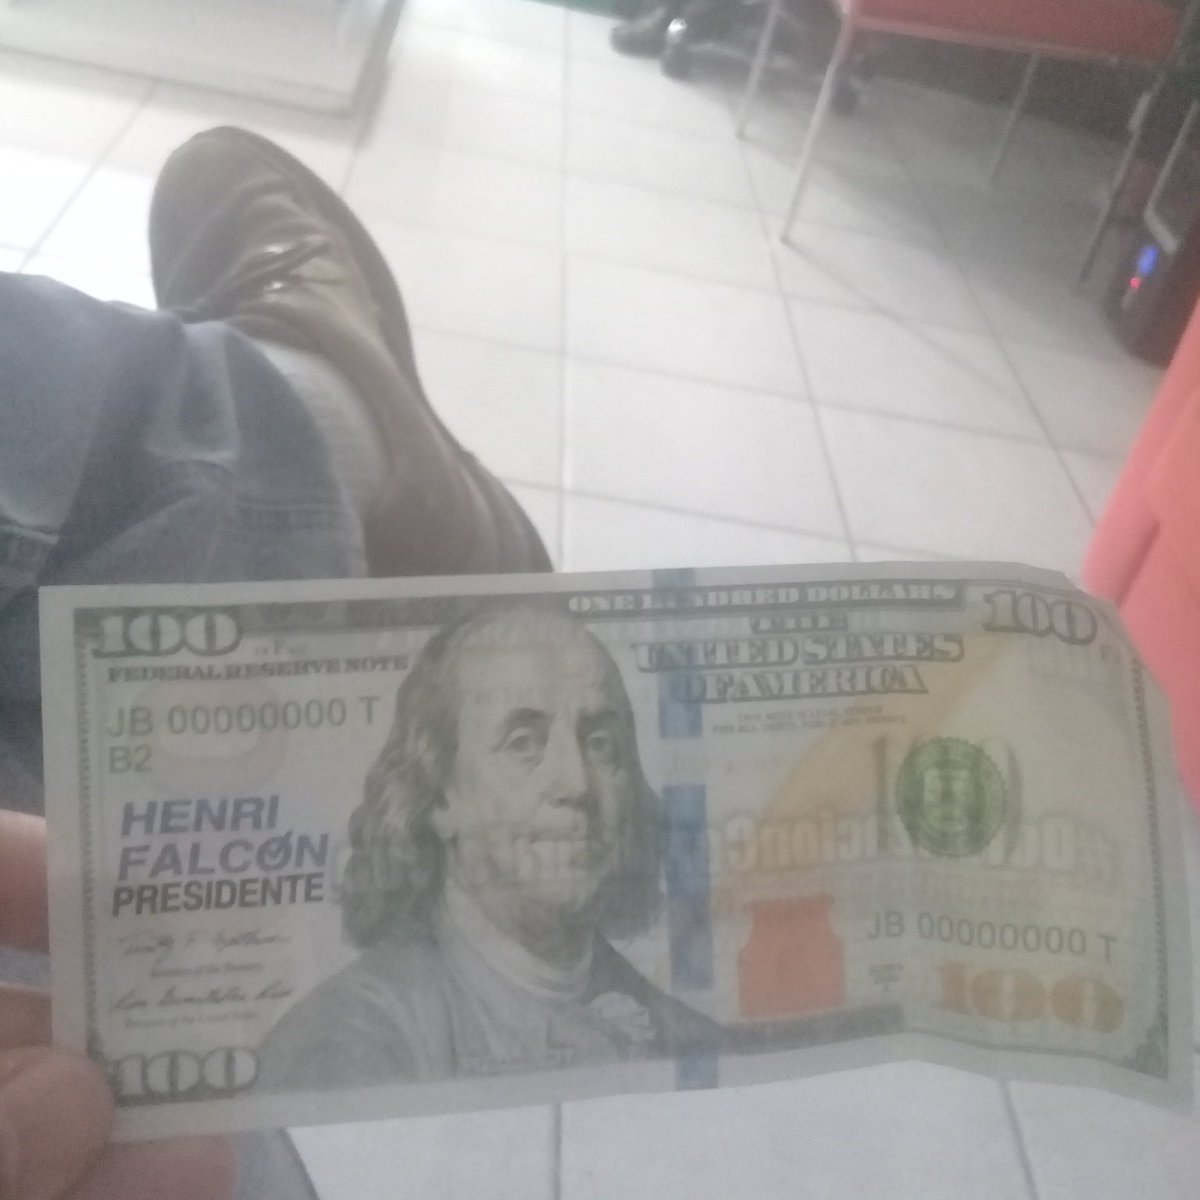 8Jun - Dictadura de Nicolas Maduro DcrodesXkAAO7W5